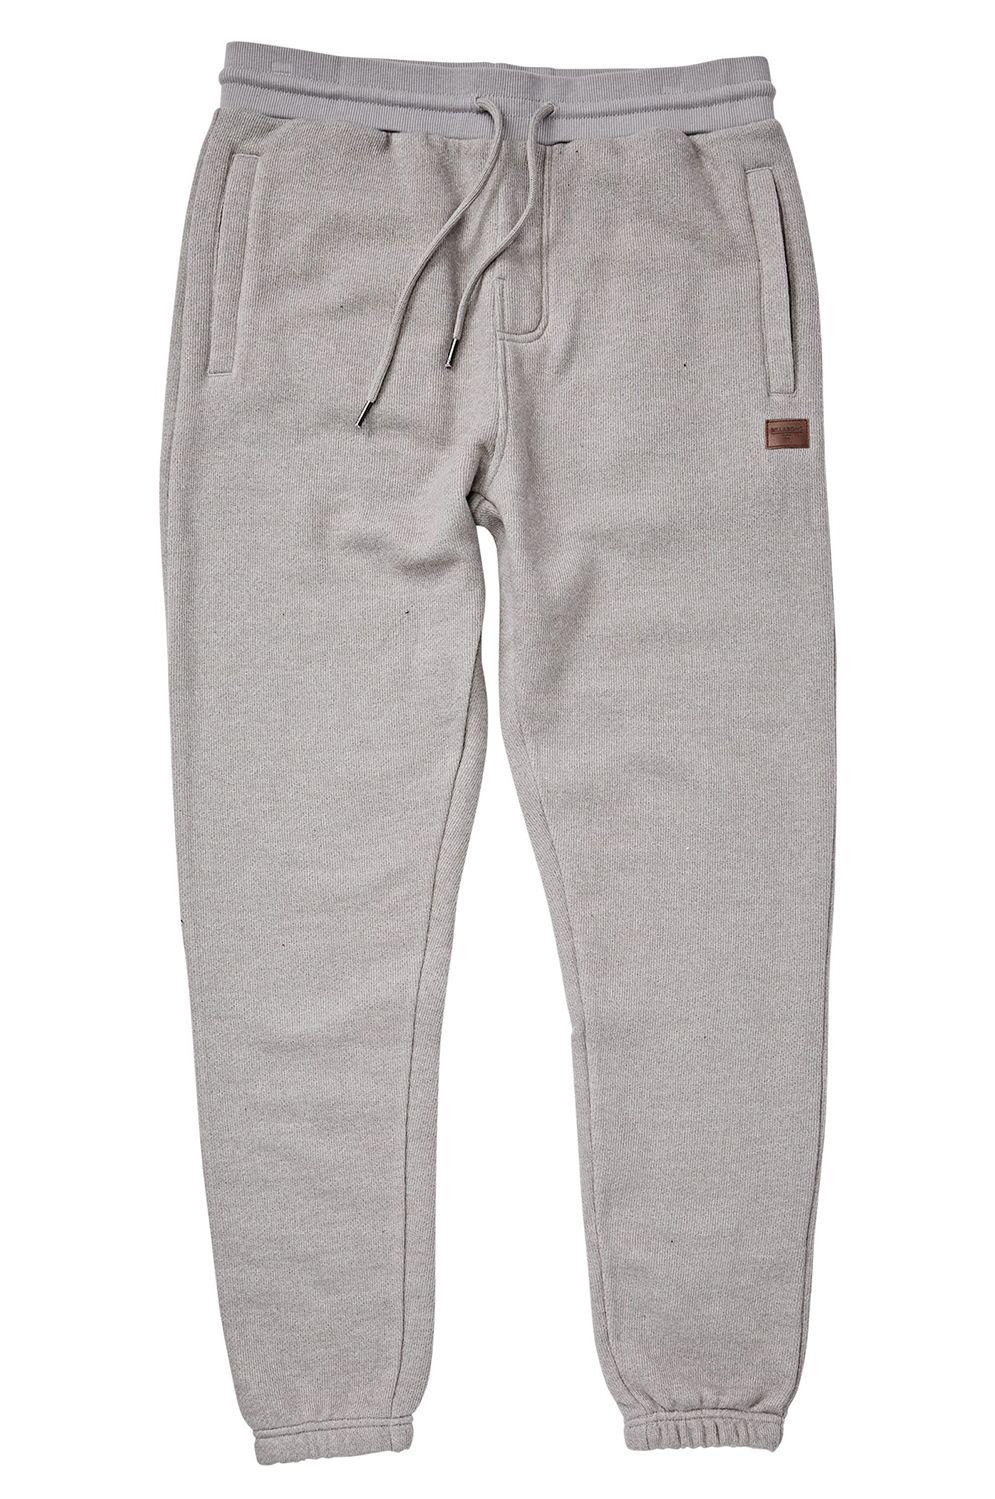 Billabong Pants BALANCE PANT CUFFED Light Grey